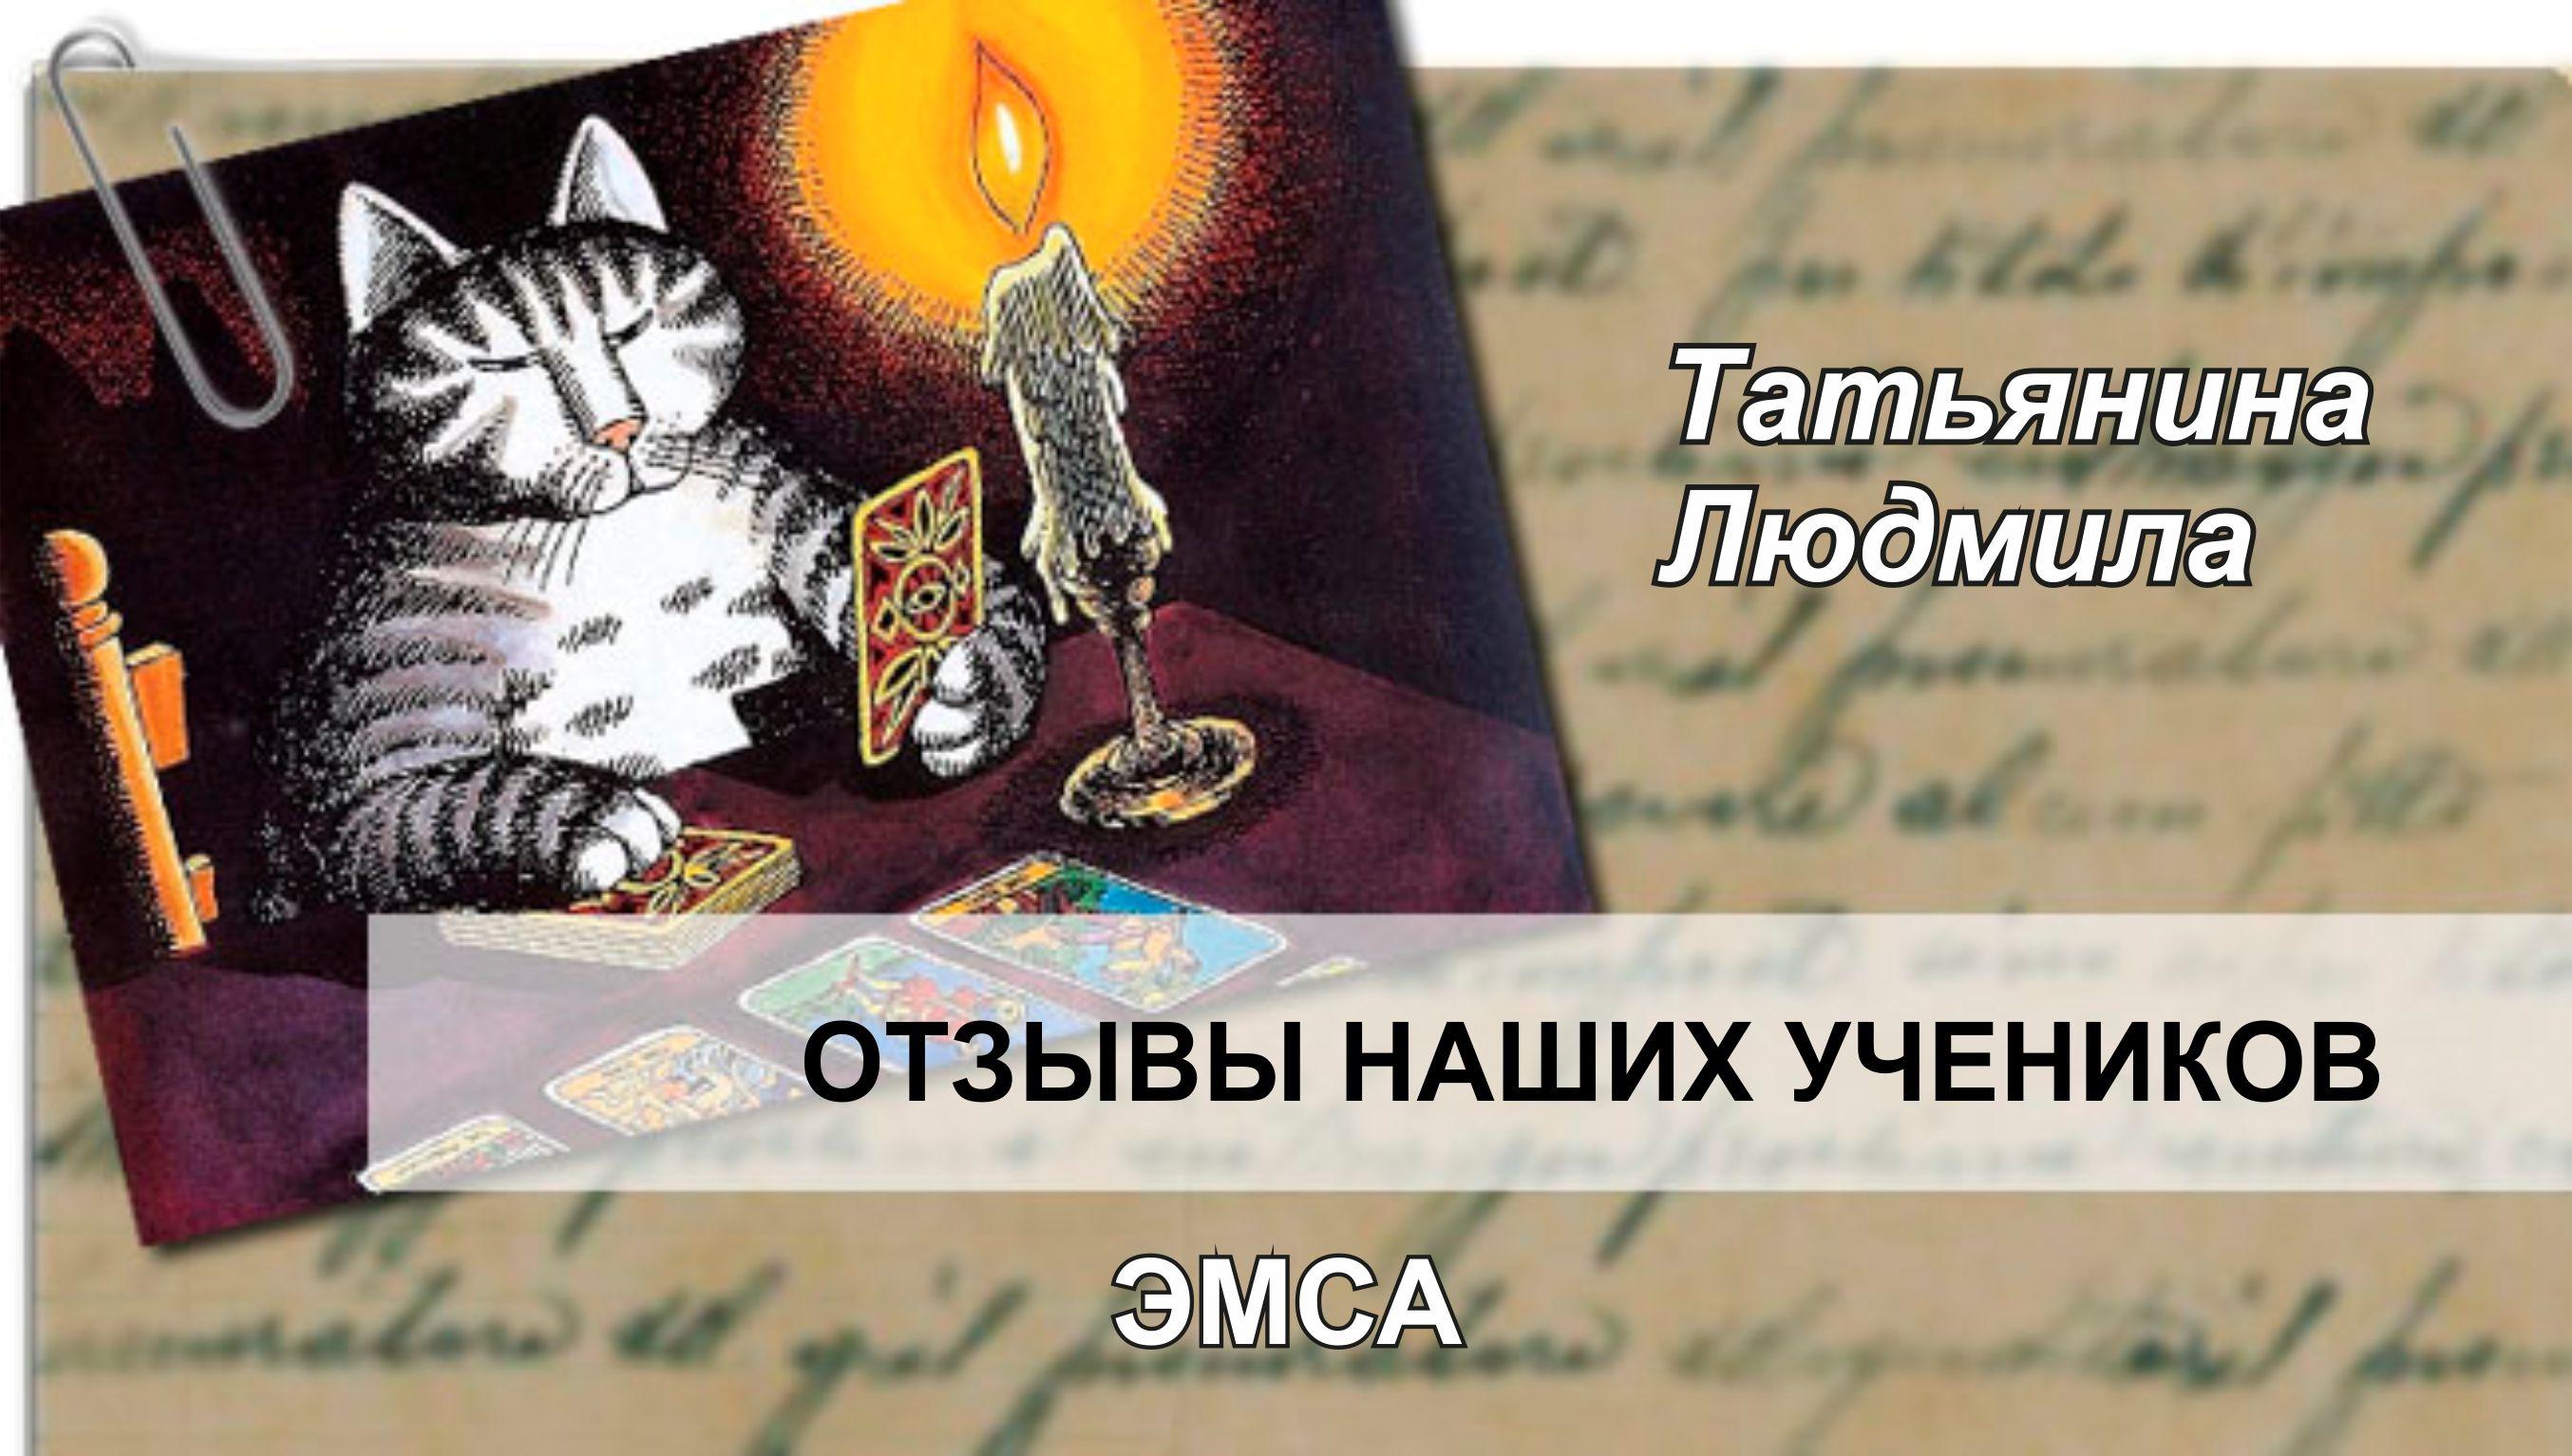 Татьянина Людмила отзыв ЭМСА